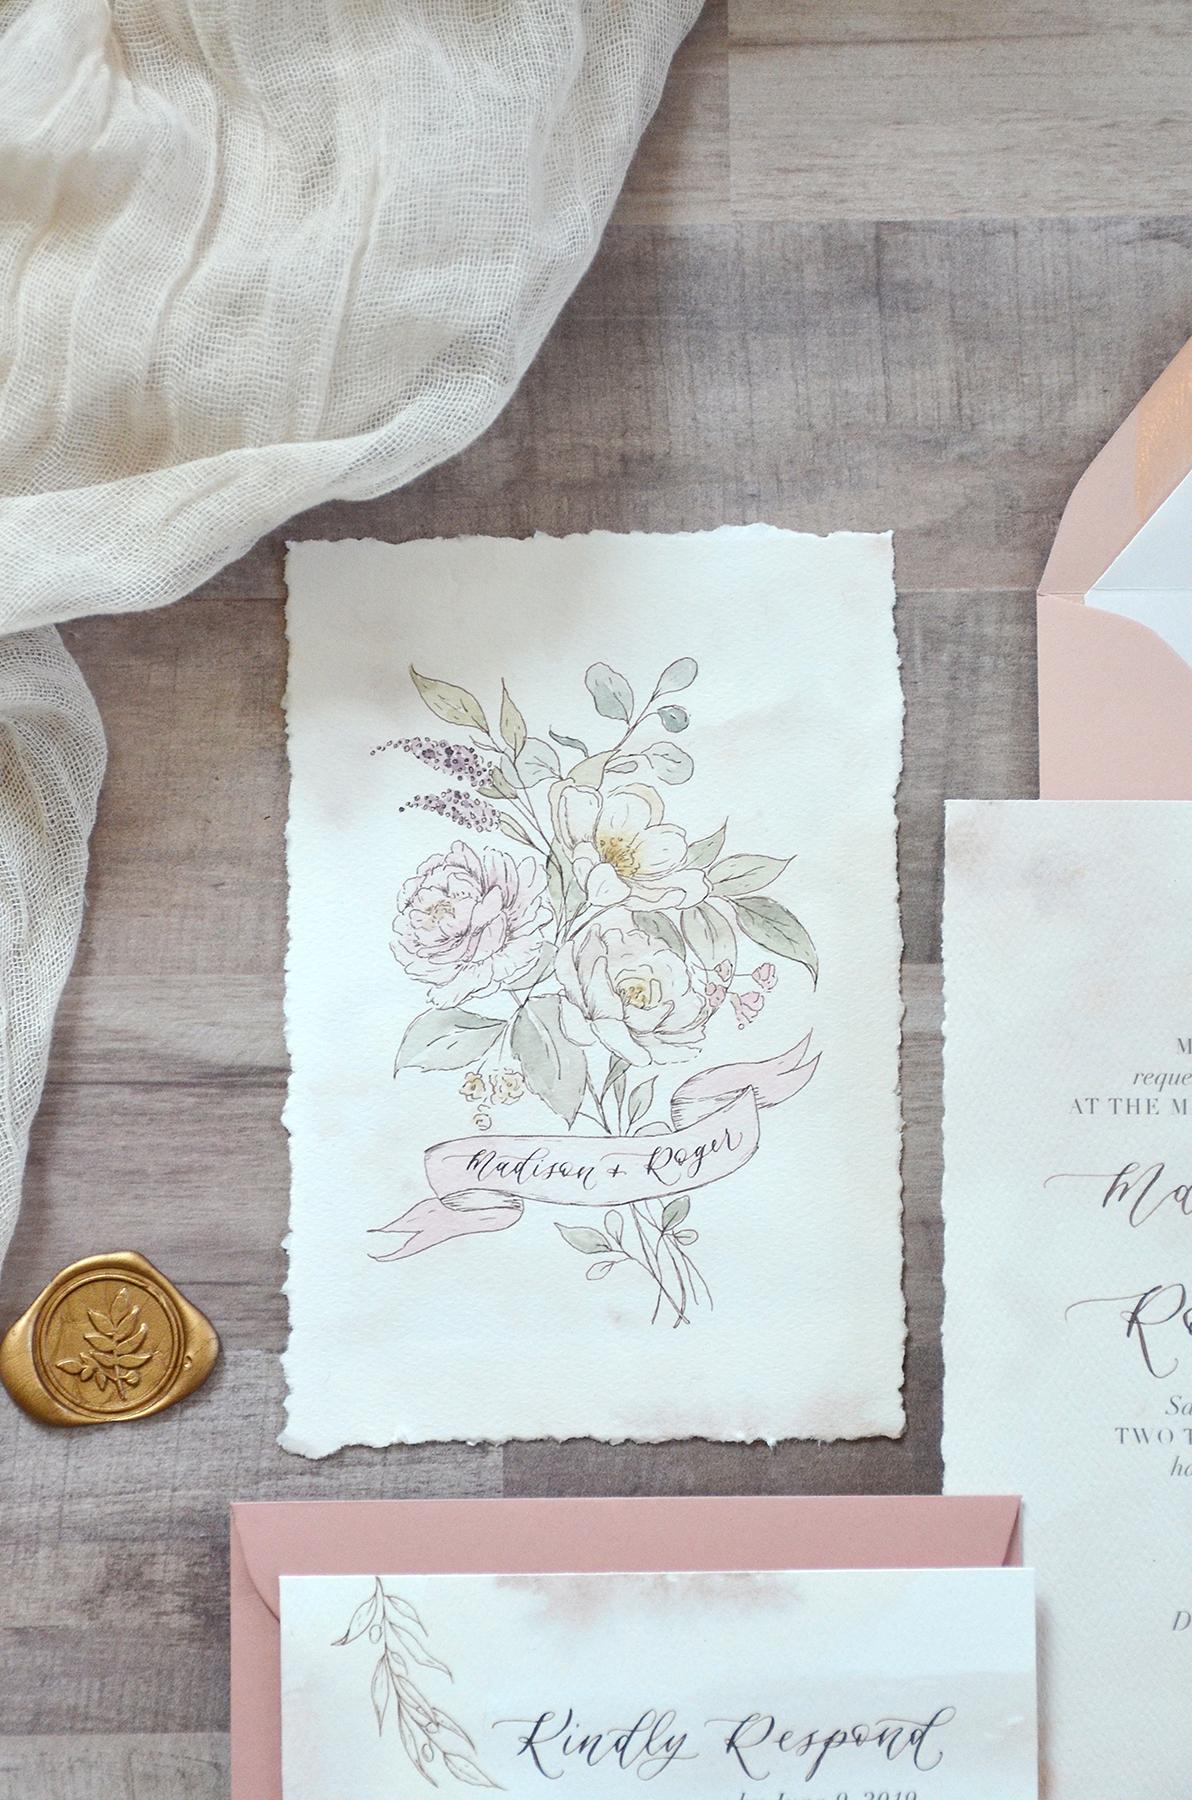 Sam Allen Creates Rose and Floral Botanical Illustrated Wedding Invitation Suite with Handtorn Edges Print